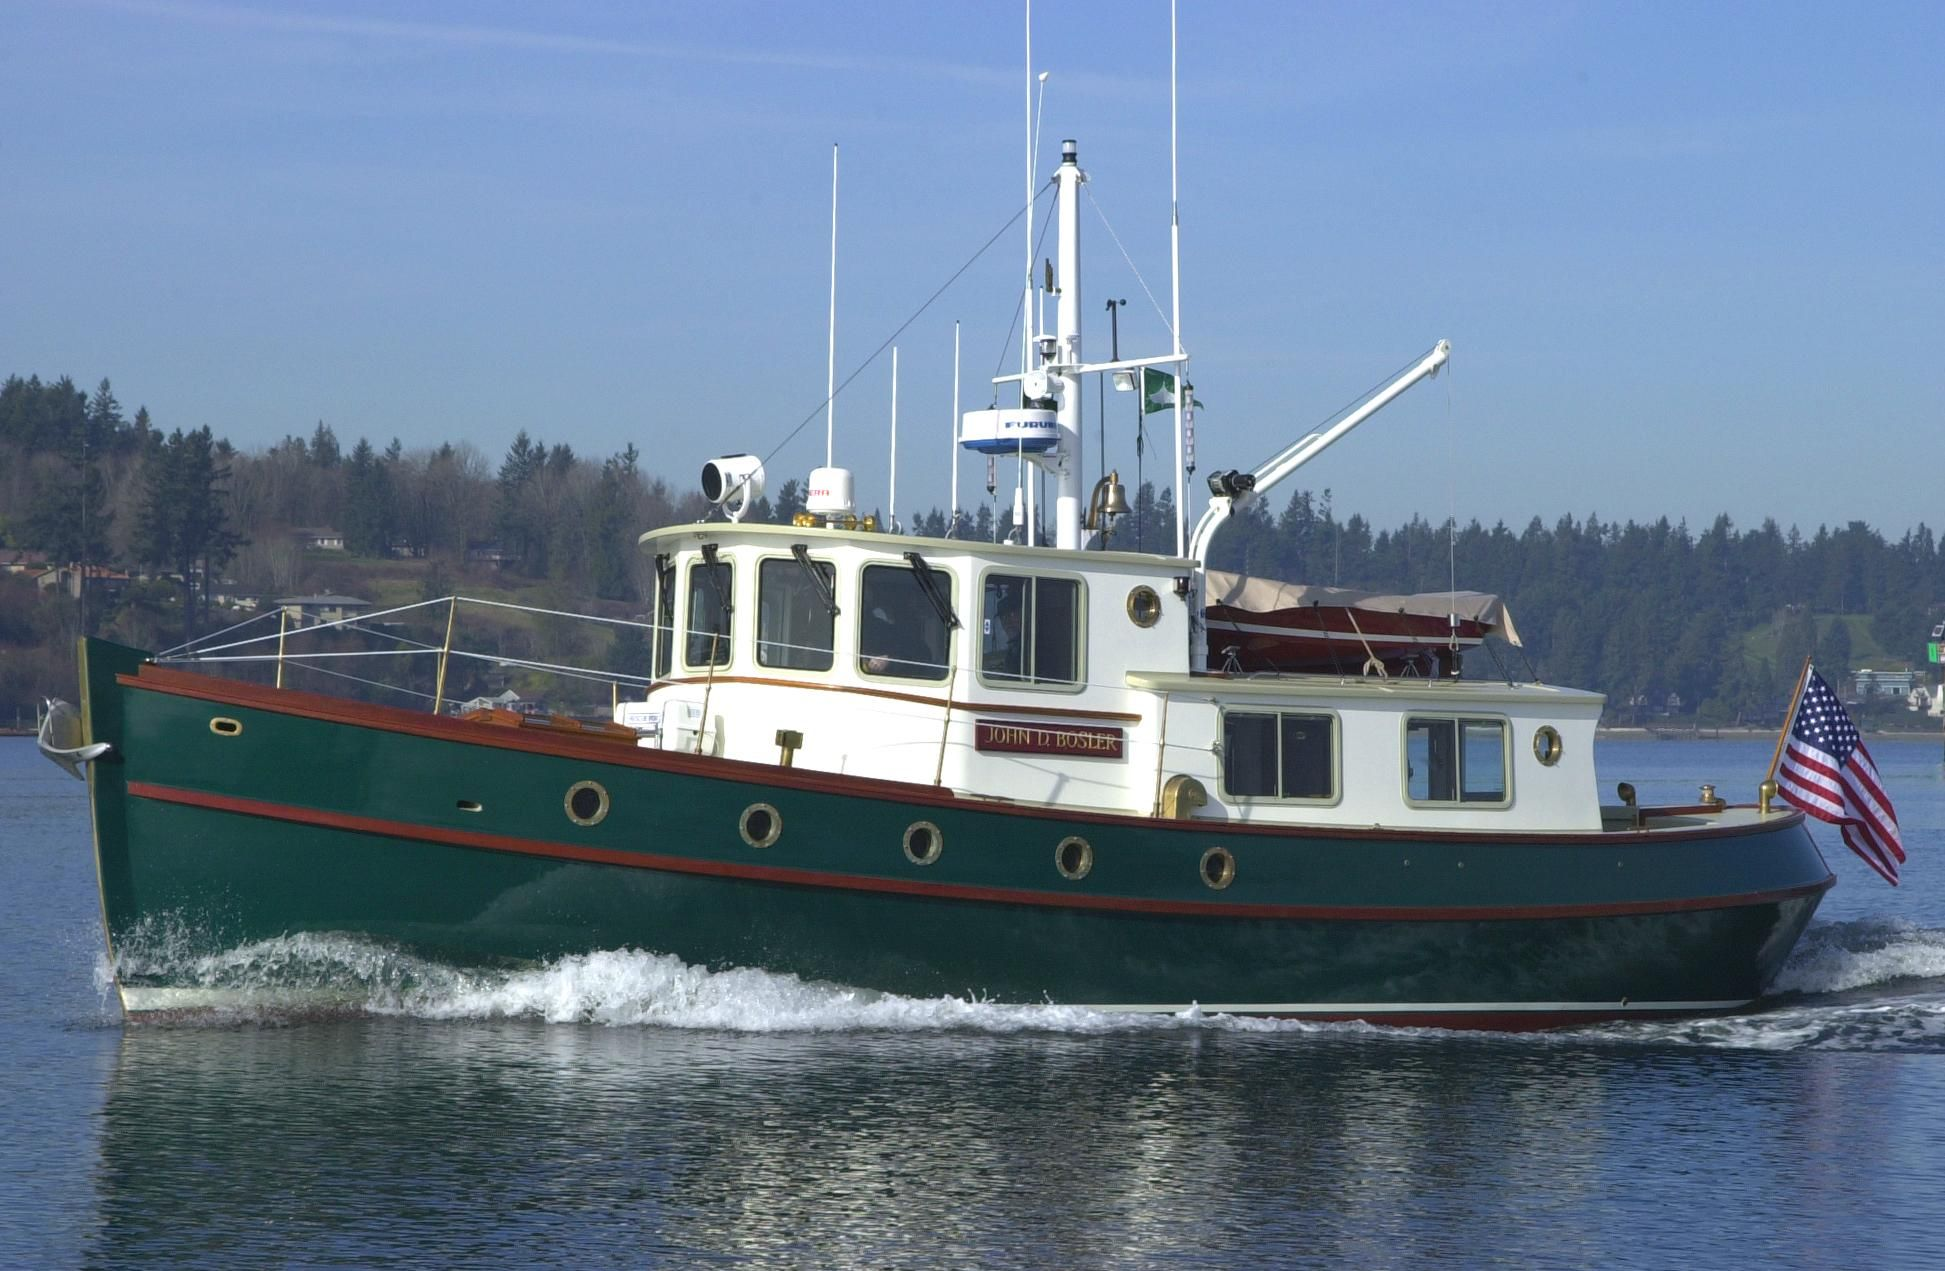 2000 Devlin Sockeye 42' Trawler Motor Boot te koop - nl.yachtworld.com